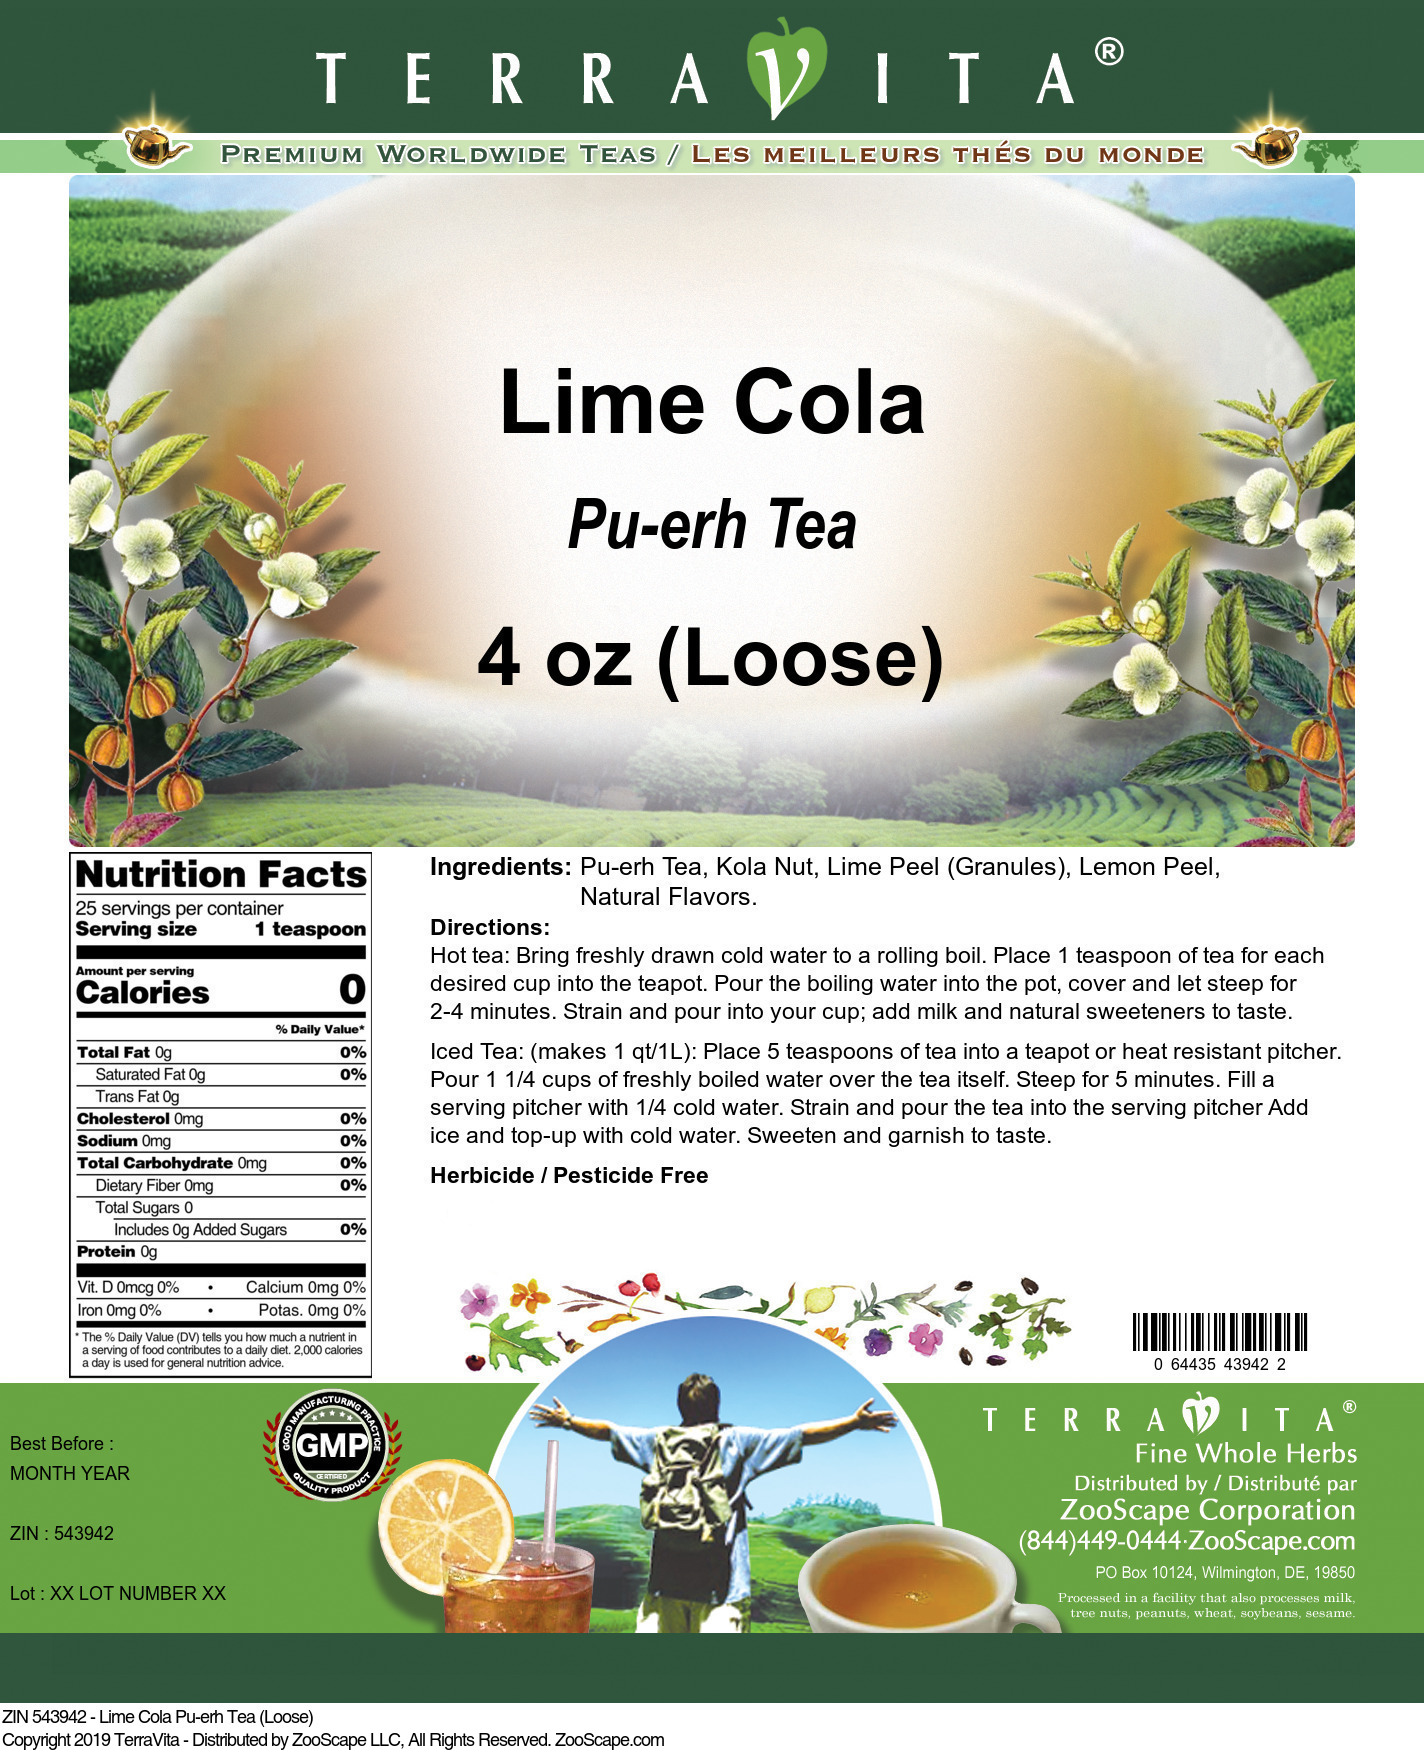 Lime Cola Pu-erh Tea